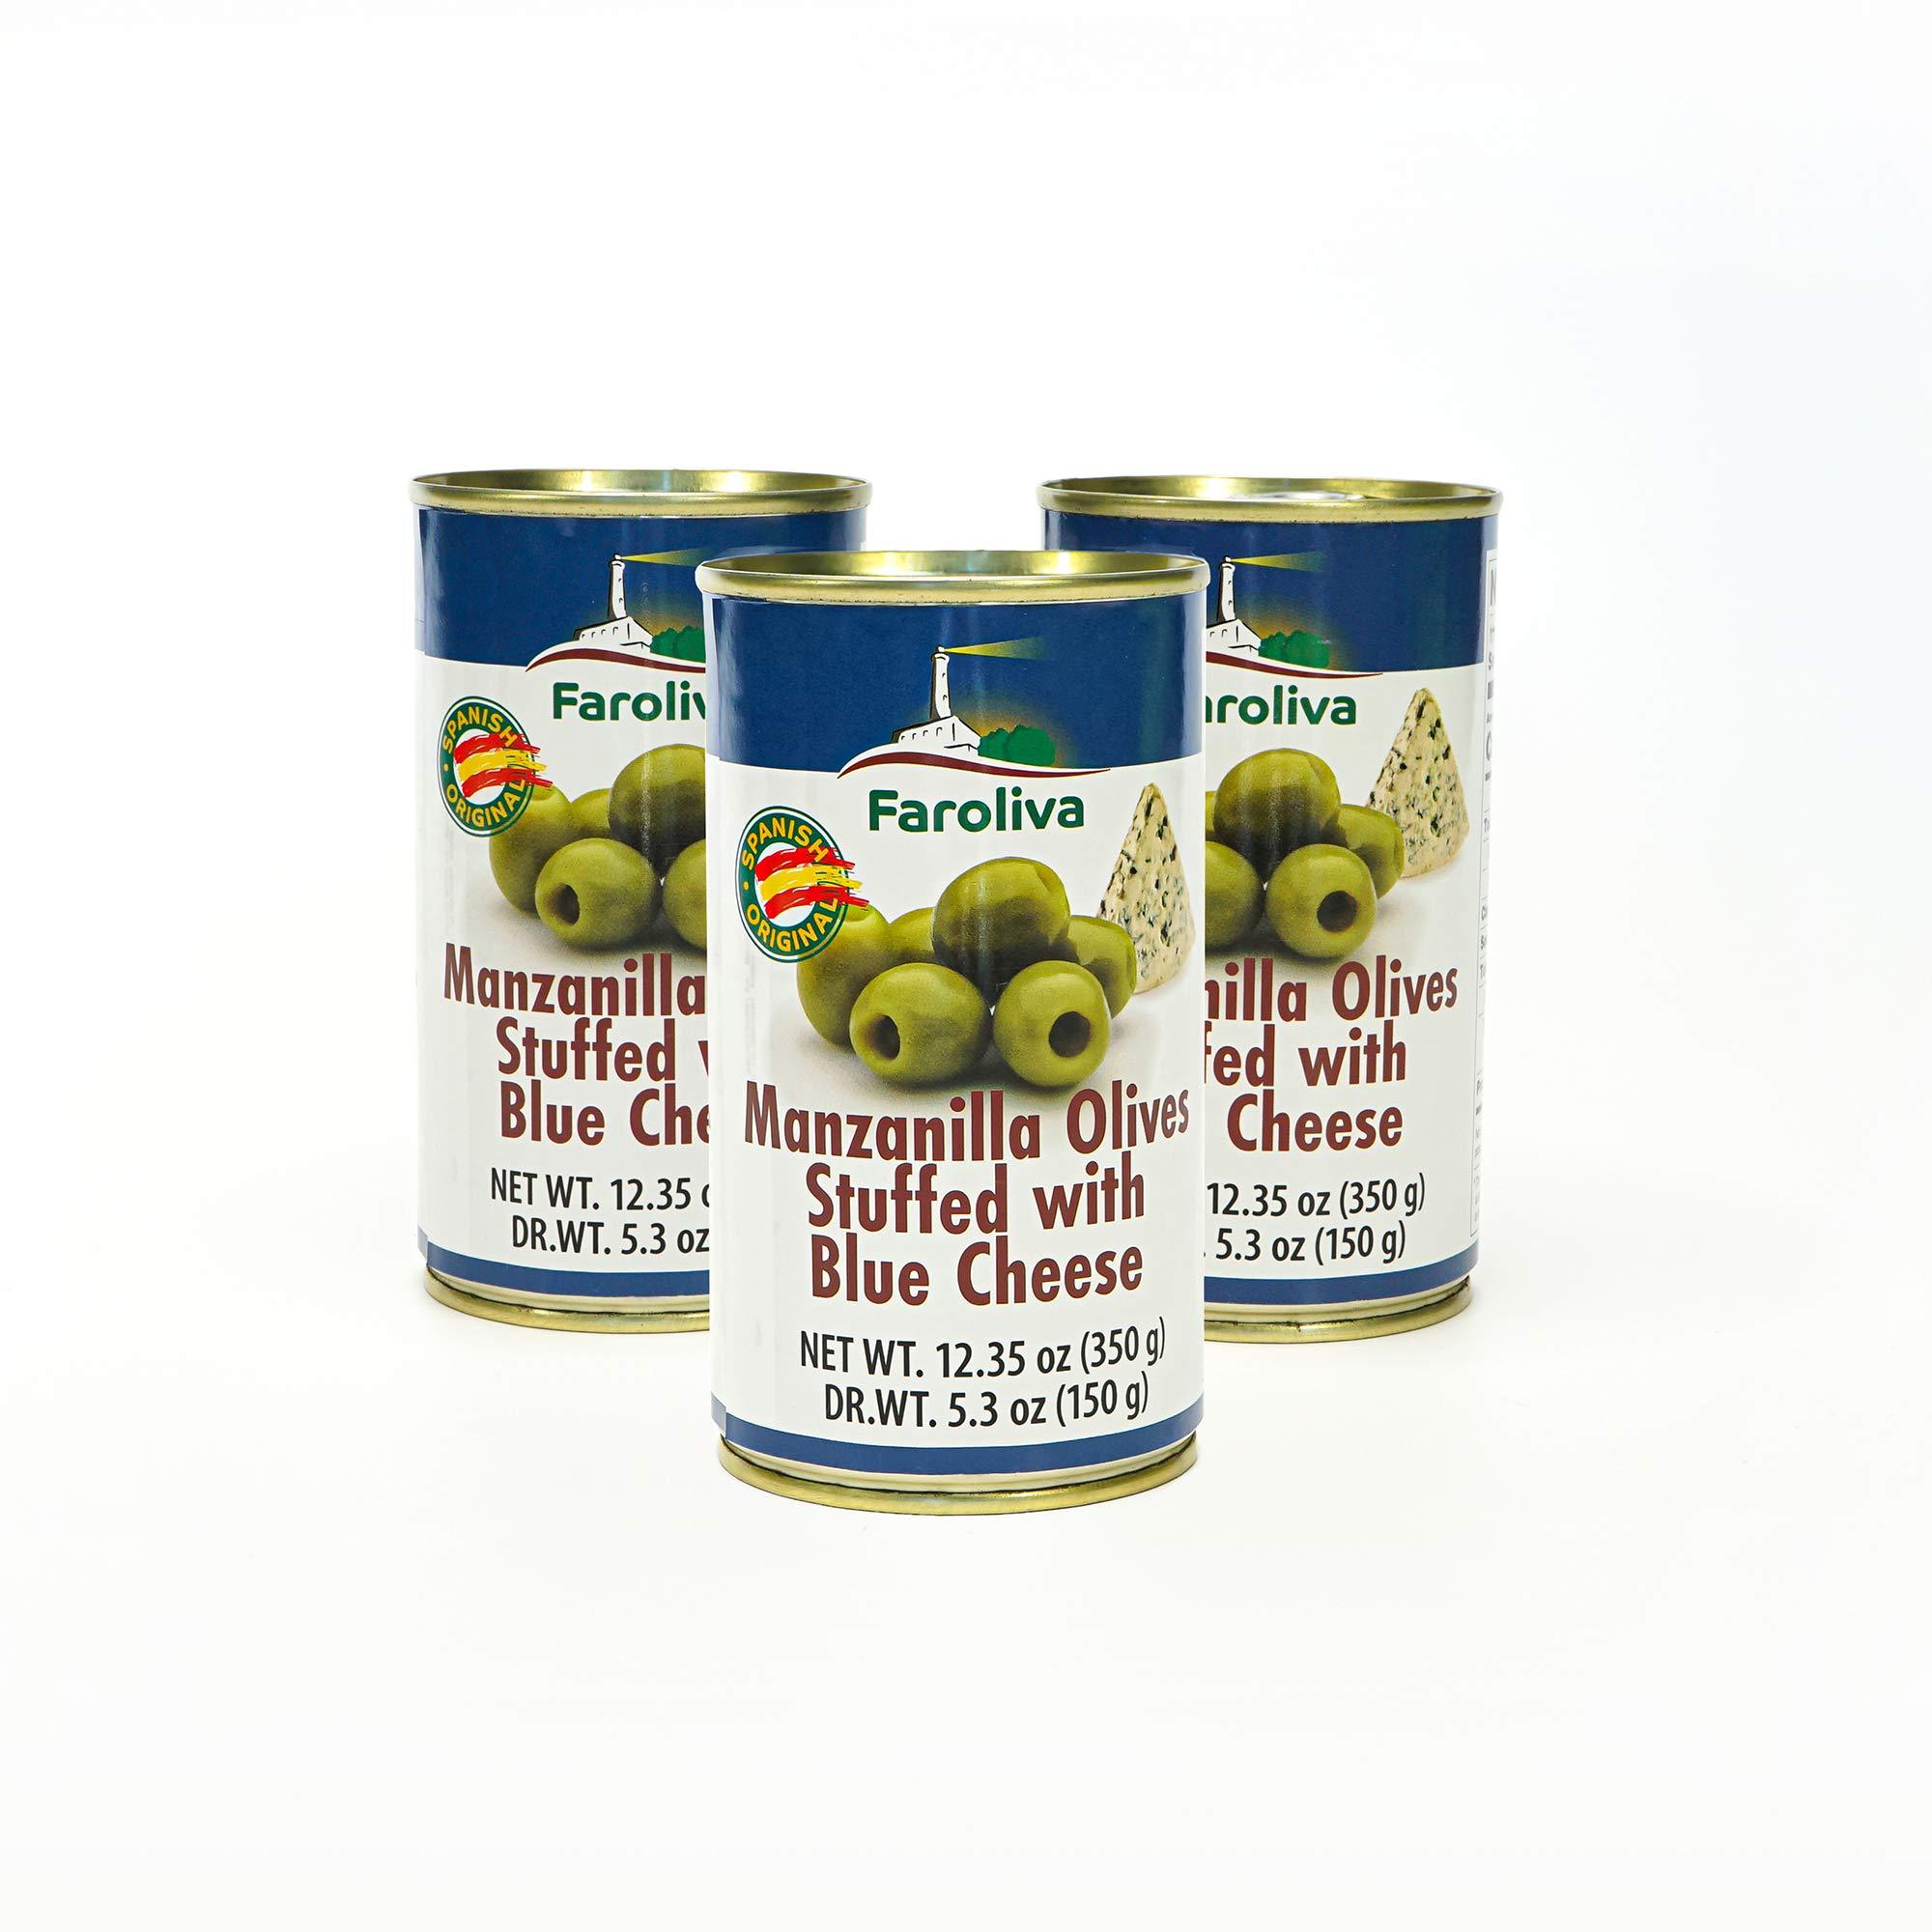 Manzanilla Olives stuffed with 12.35 oz (350g) by Faroliva (Blue Cheese, 3 Pack)